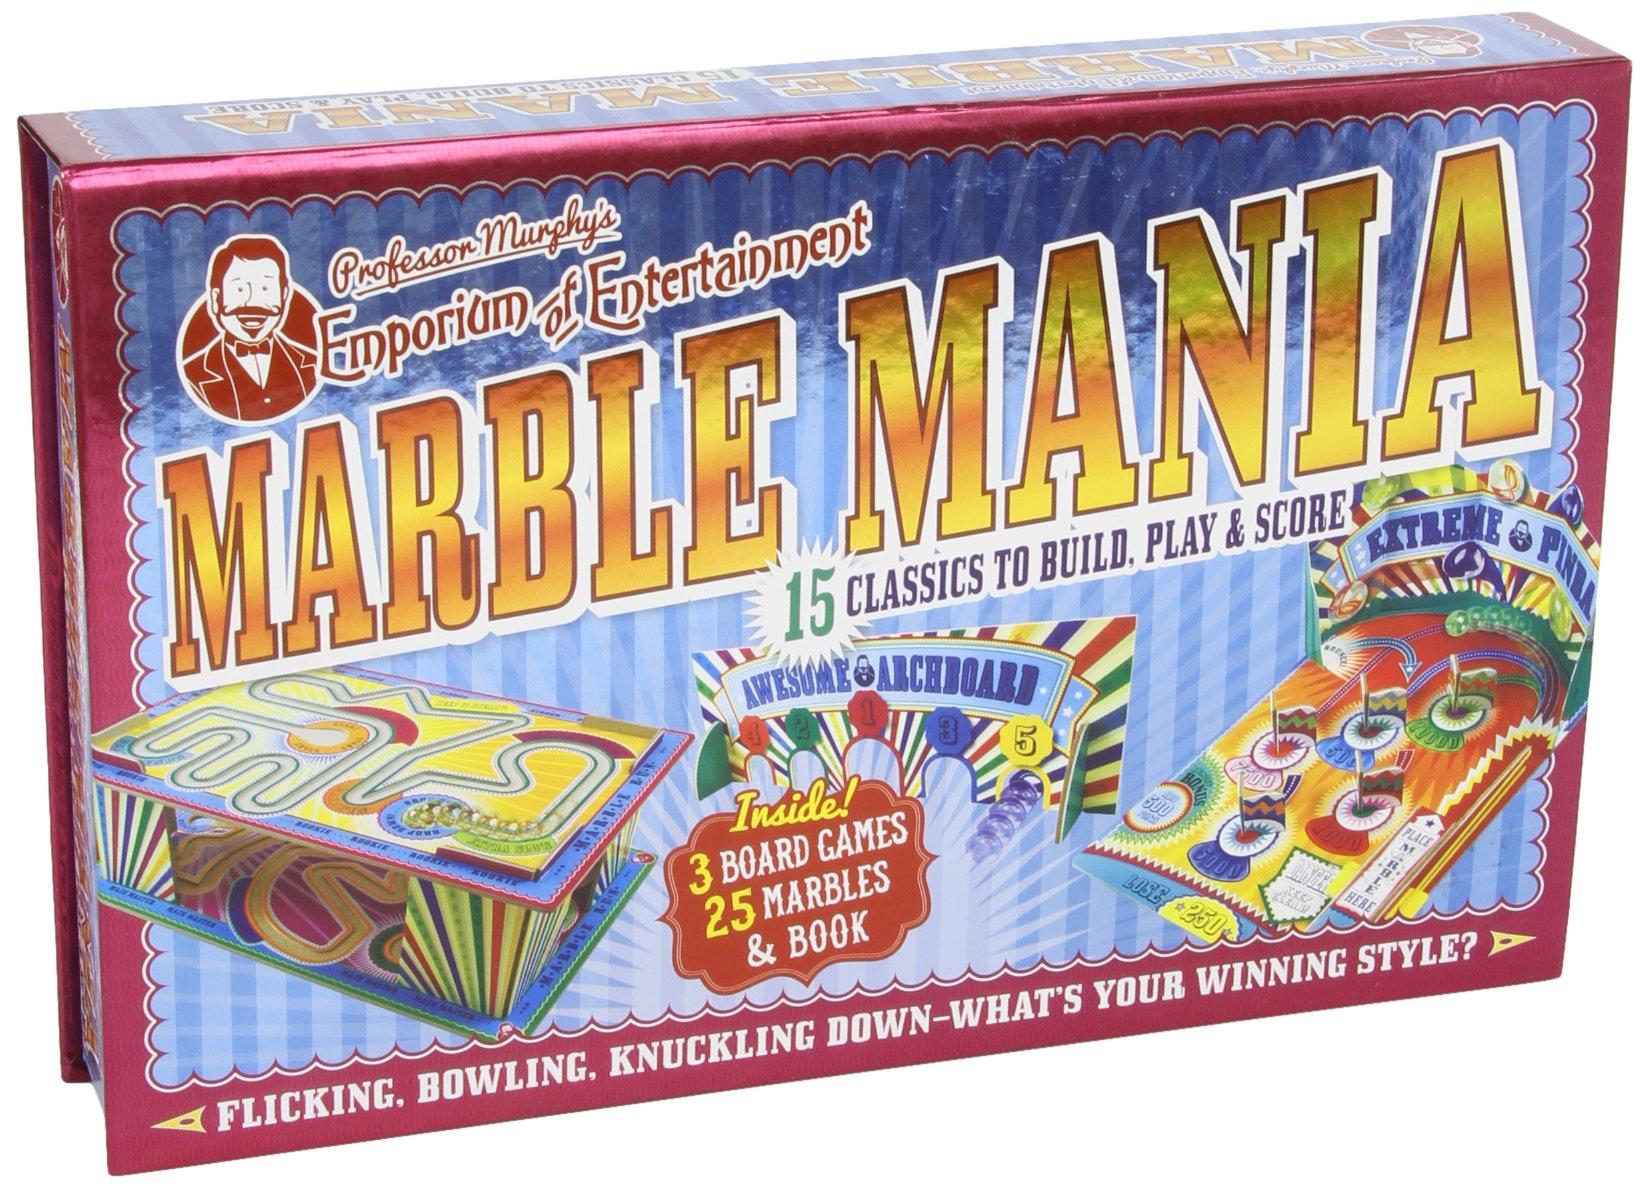 Professor Murphy's  Marble Mania